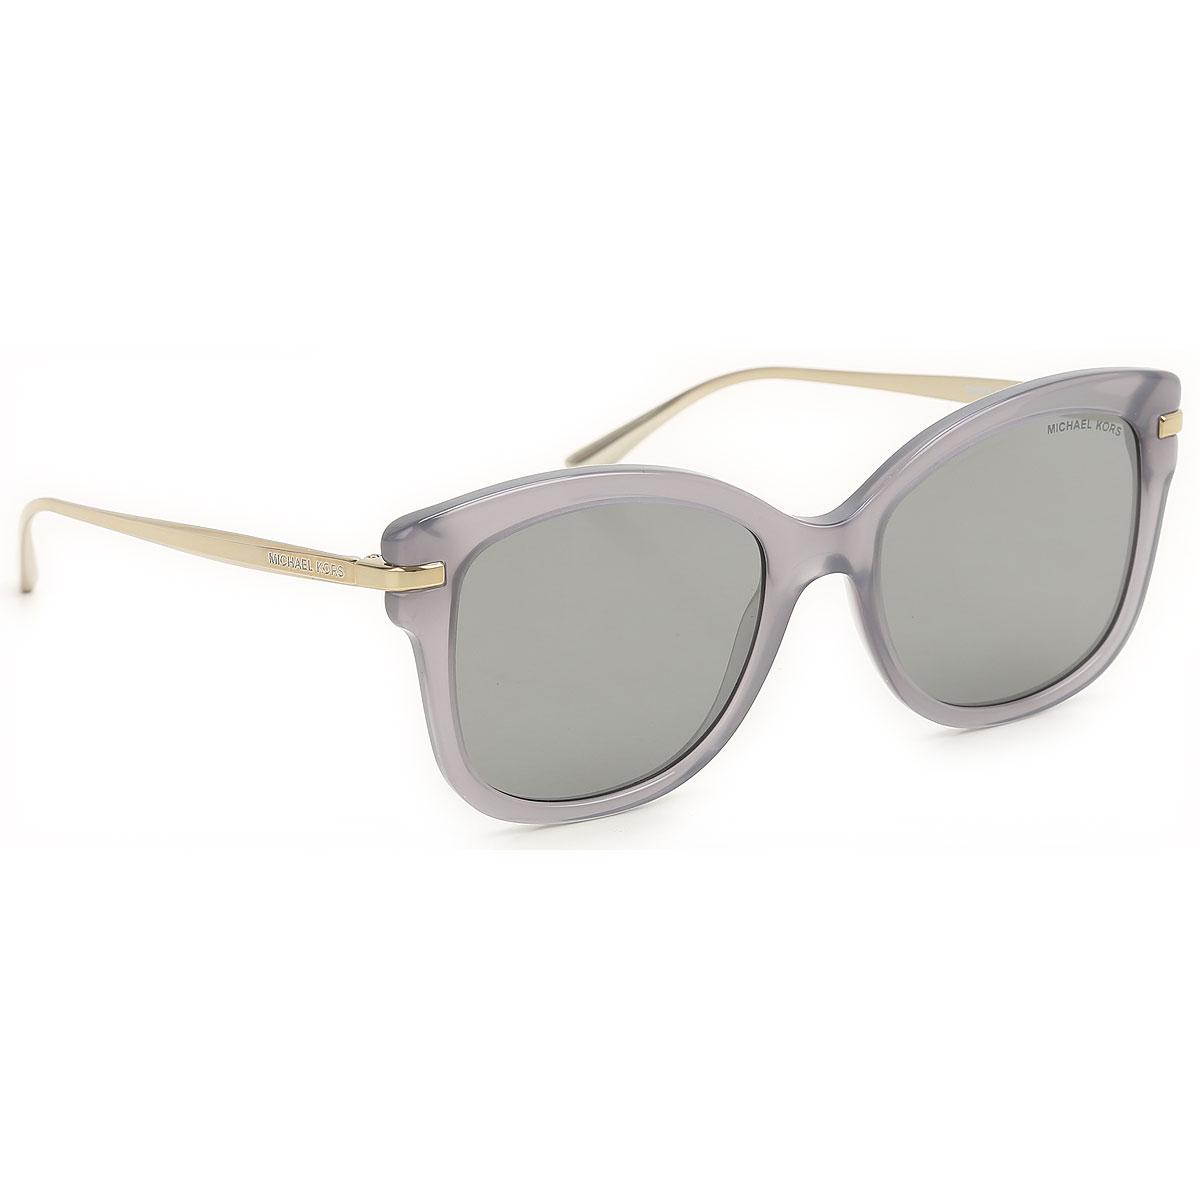 Michael Kors Sunglasses On Sale, Gray, 2017